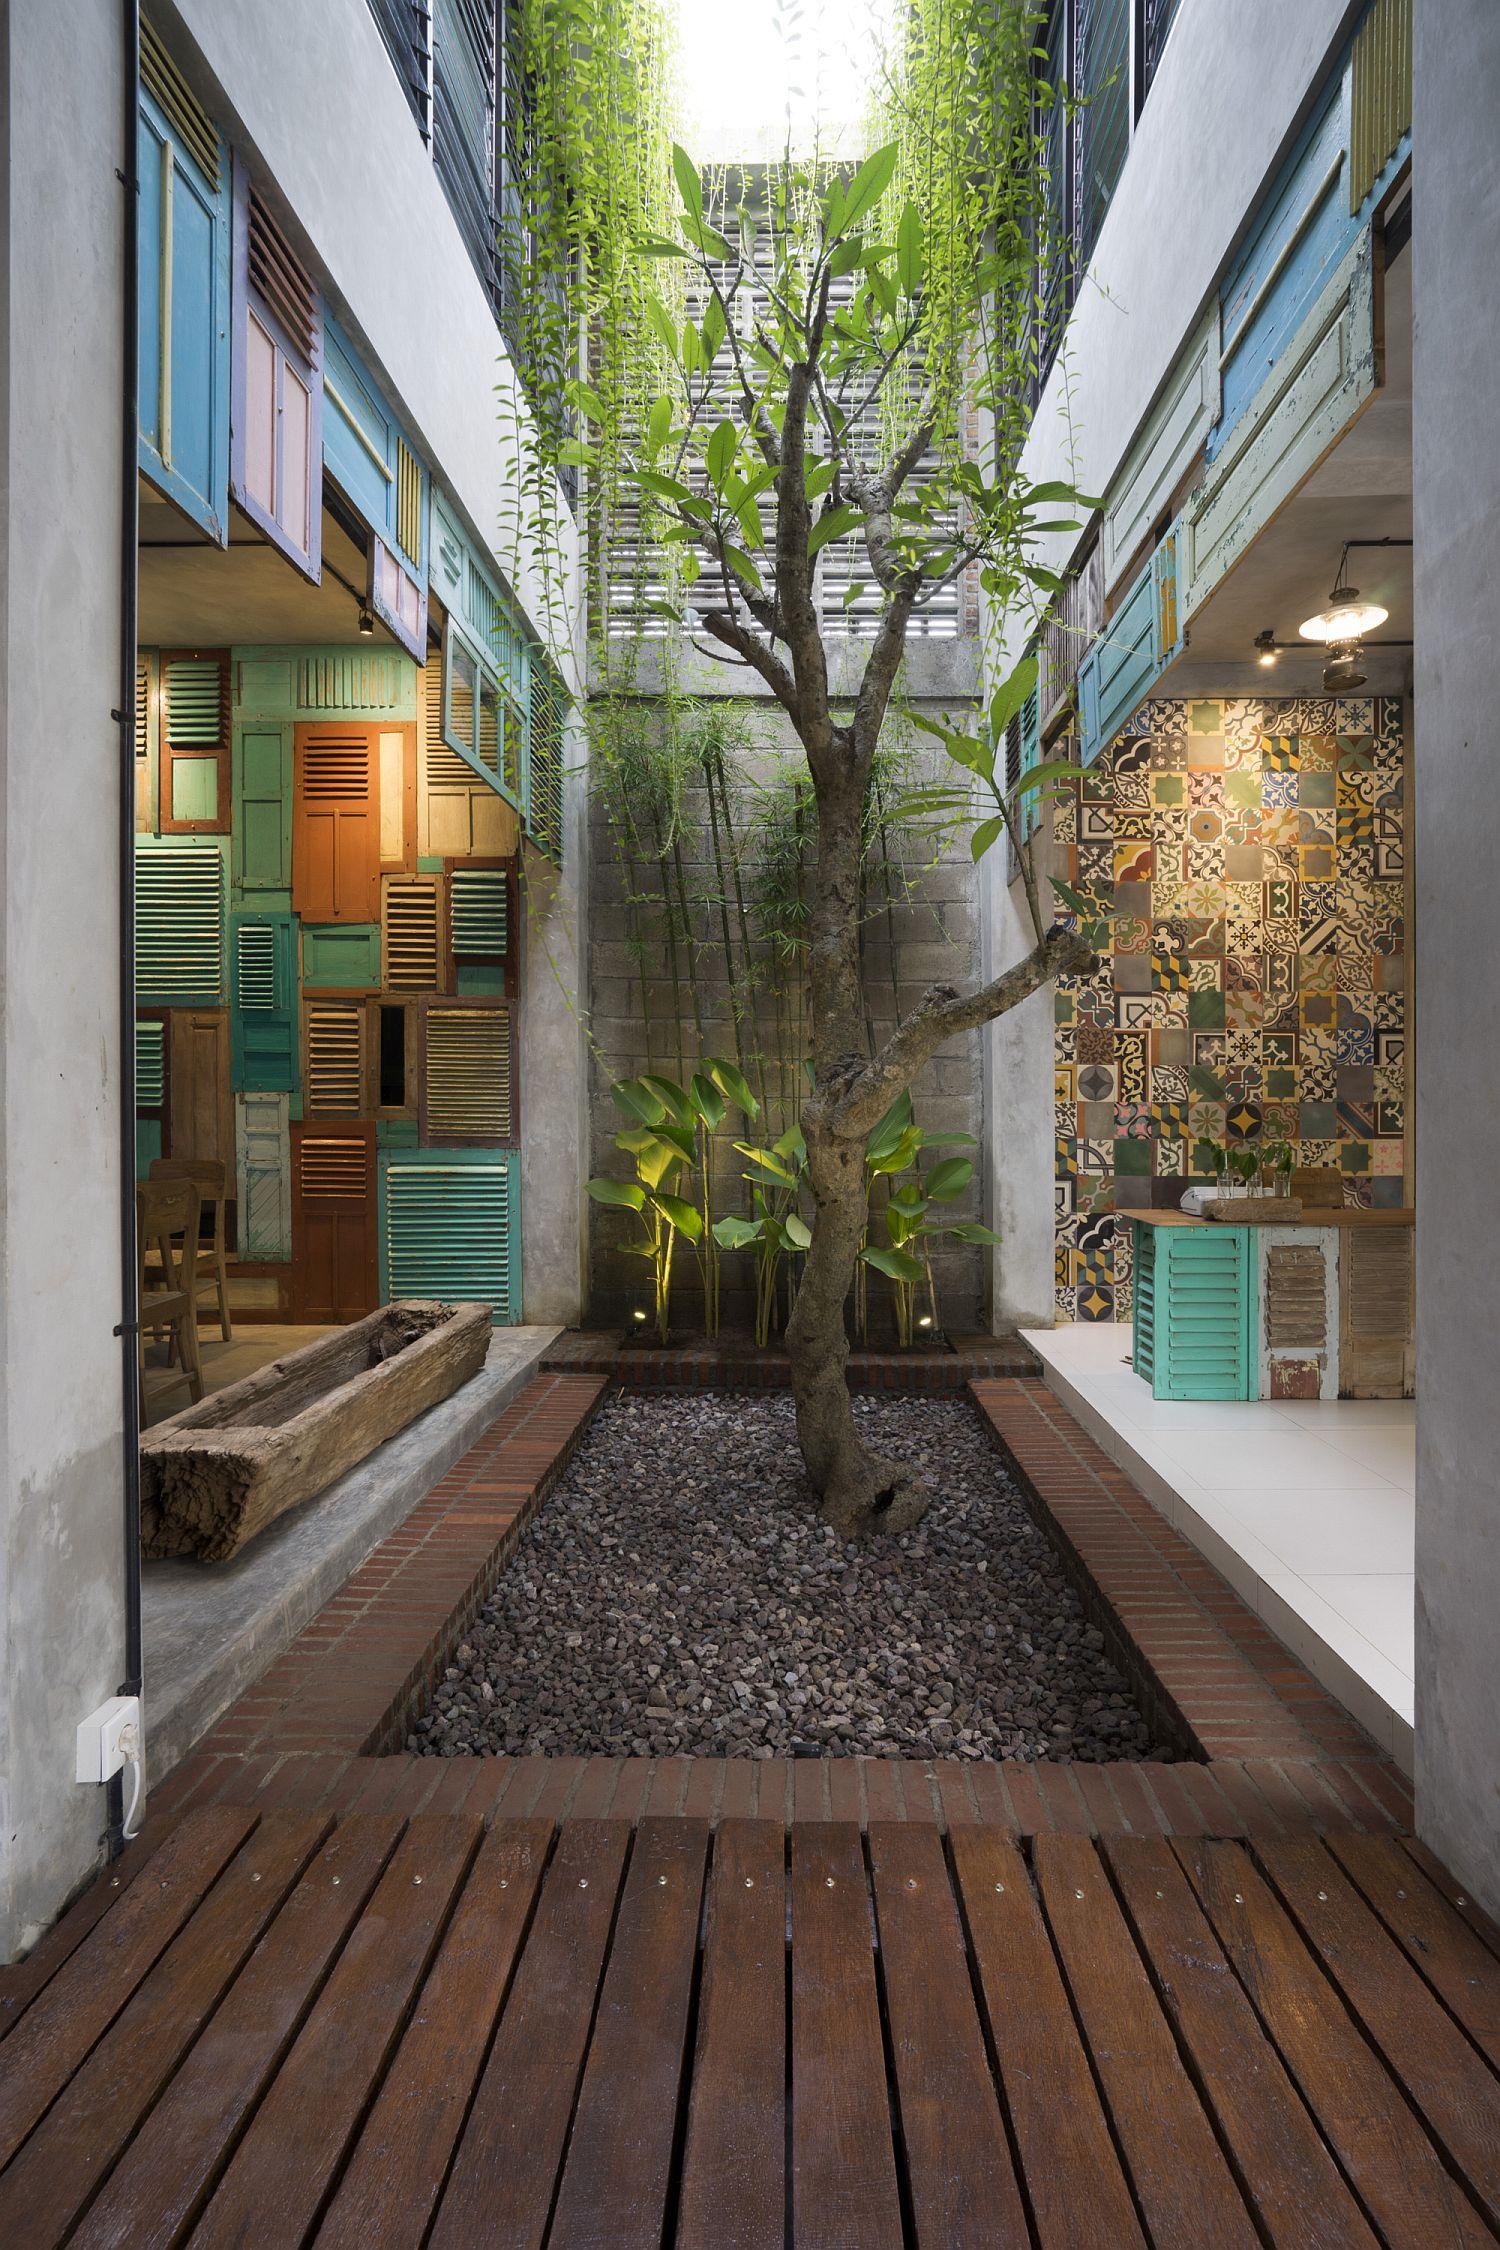 Healthier Lifestyle Gorgeous Atriums Create a More Cheerful Home